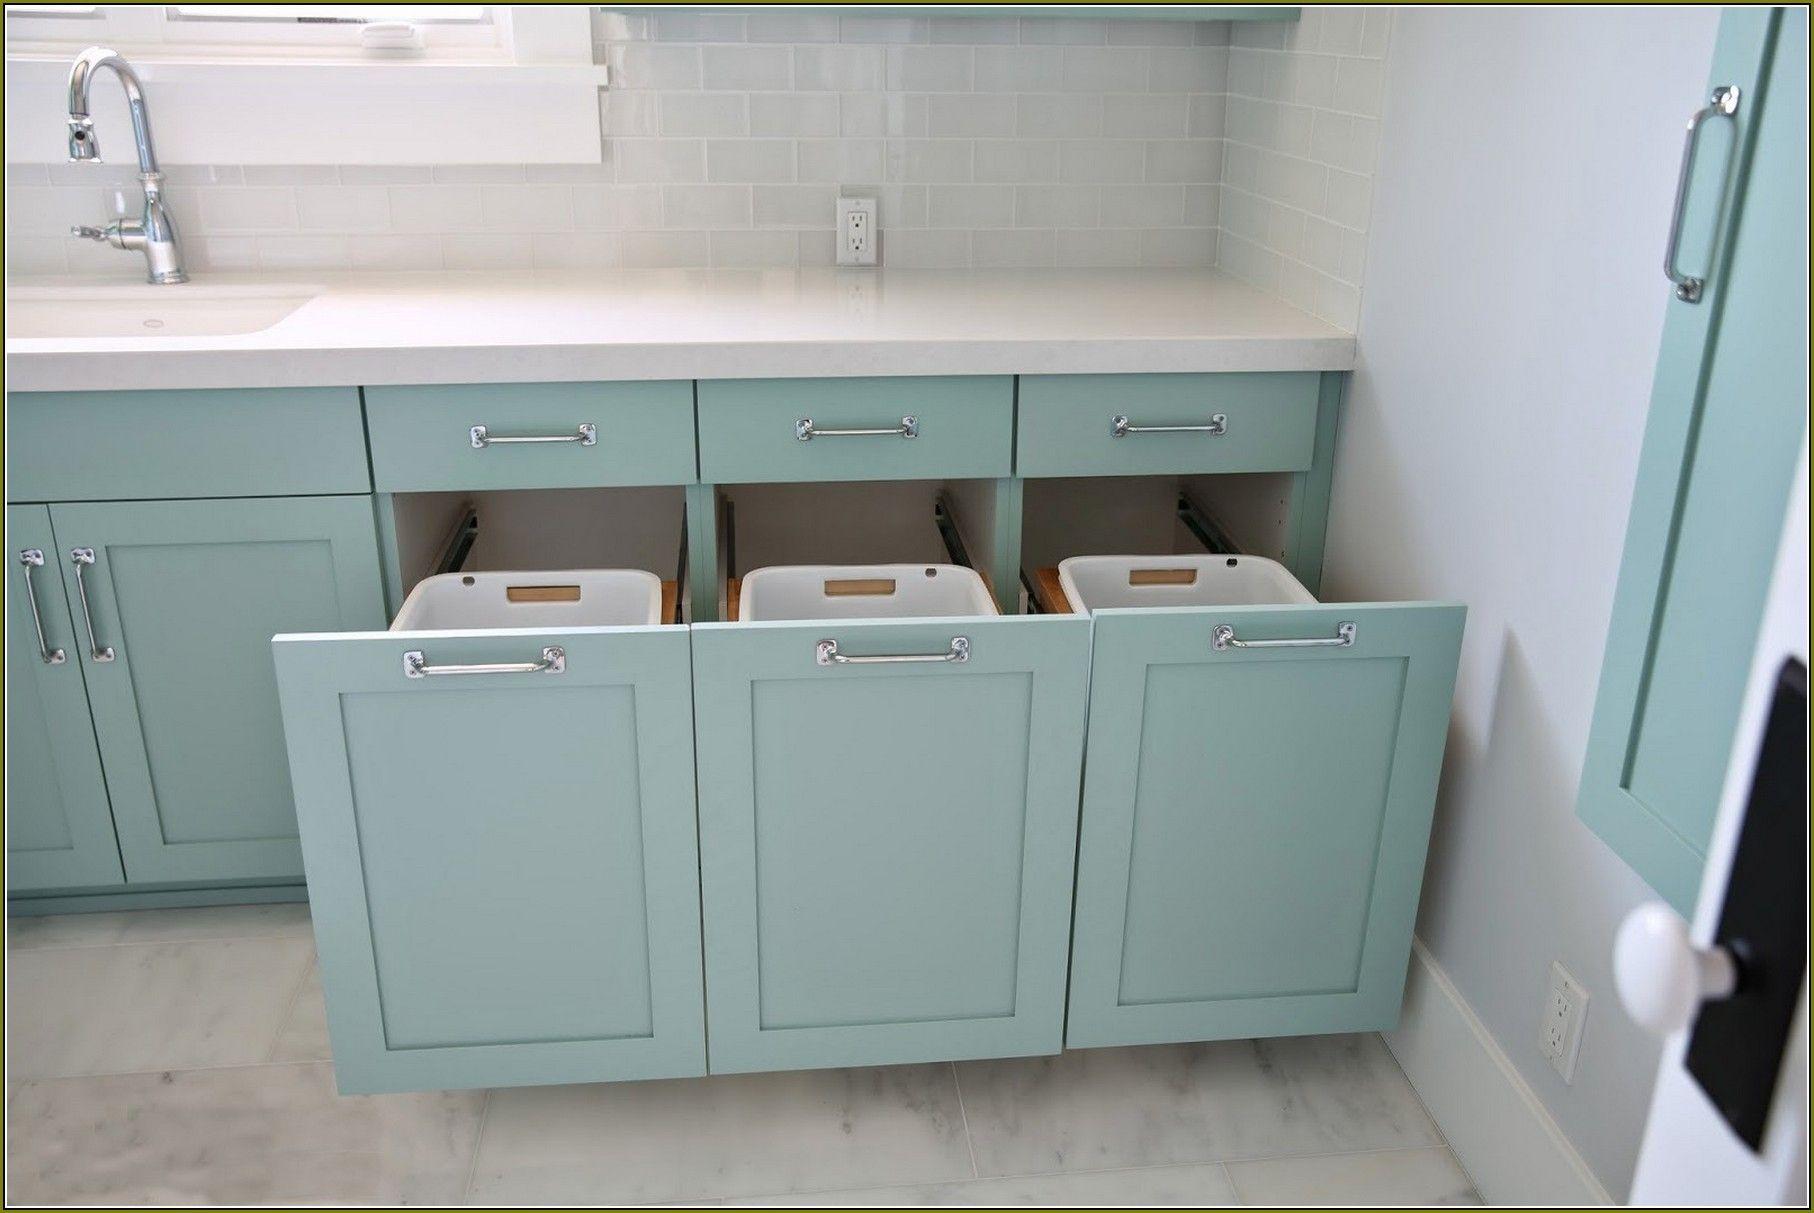 Corner Laundry Hamper Cabinet Laundry Cabinets Laundry Hamper Laundry Room Cabinets